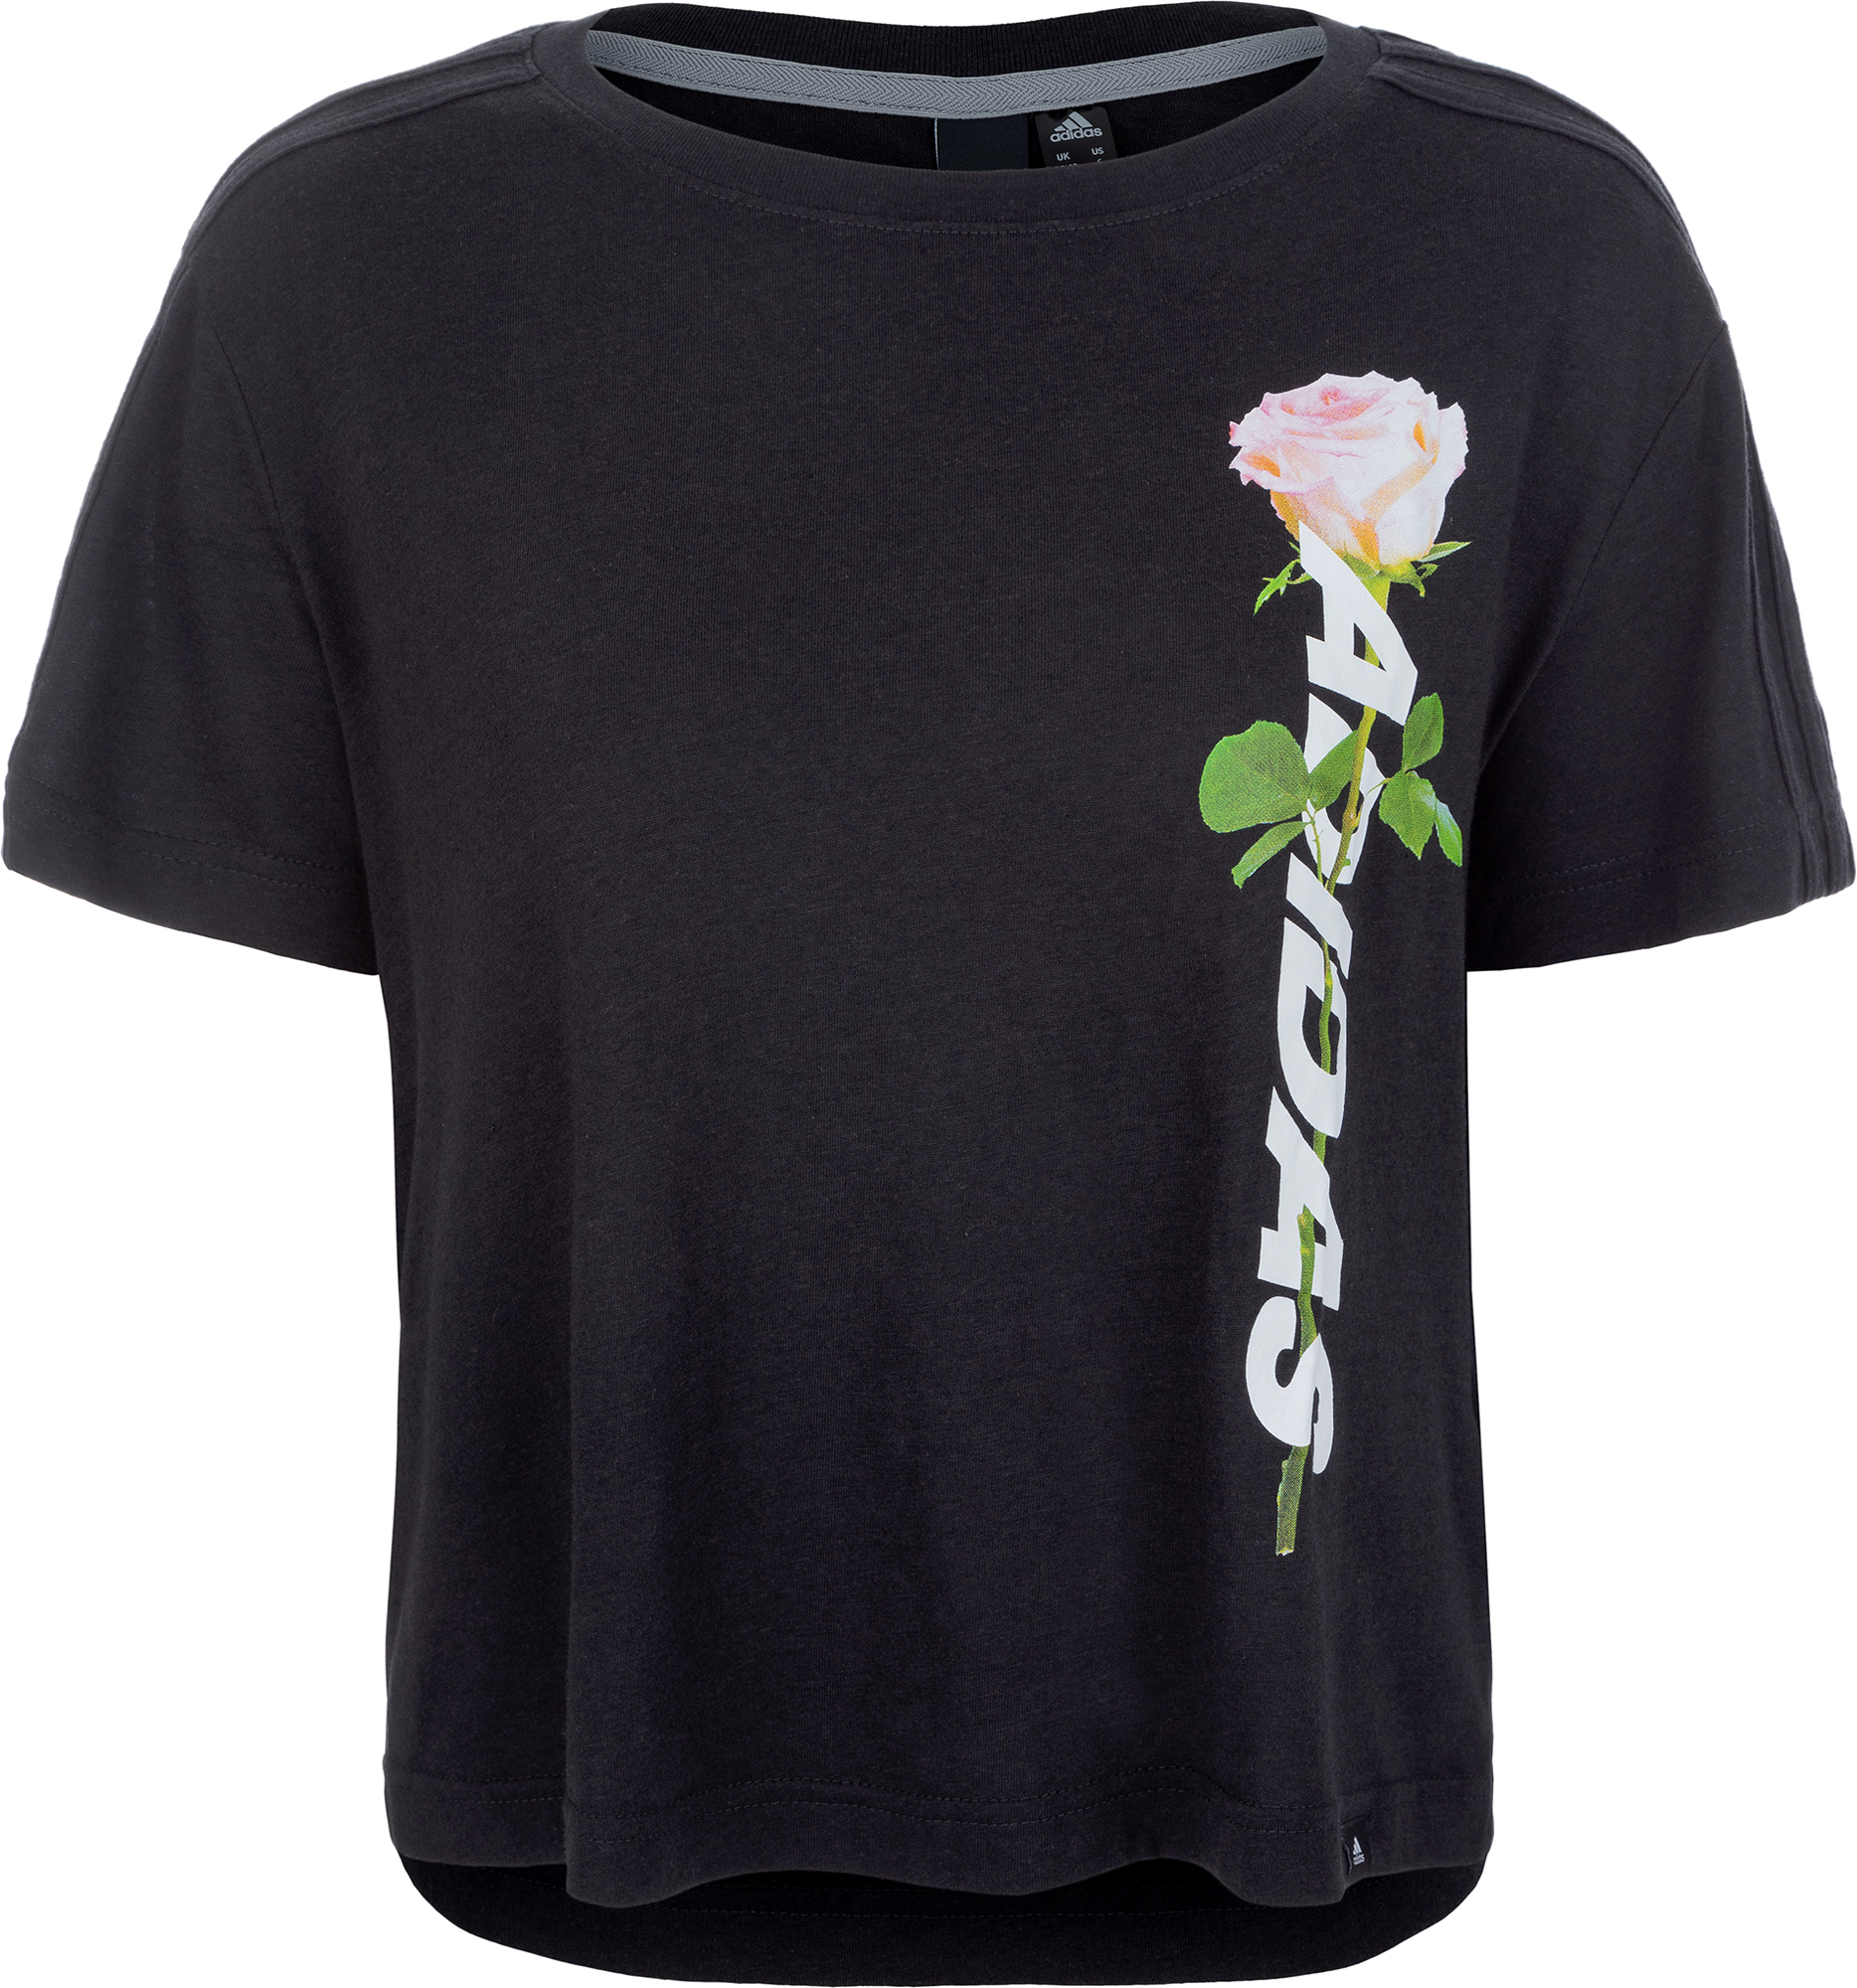 Adidas Футболка женская Adidas Floral Essential, размер M цена